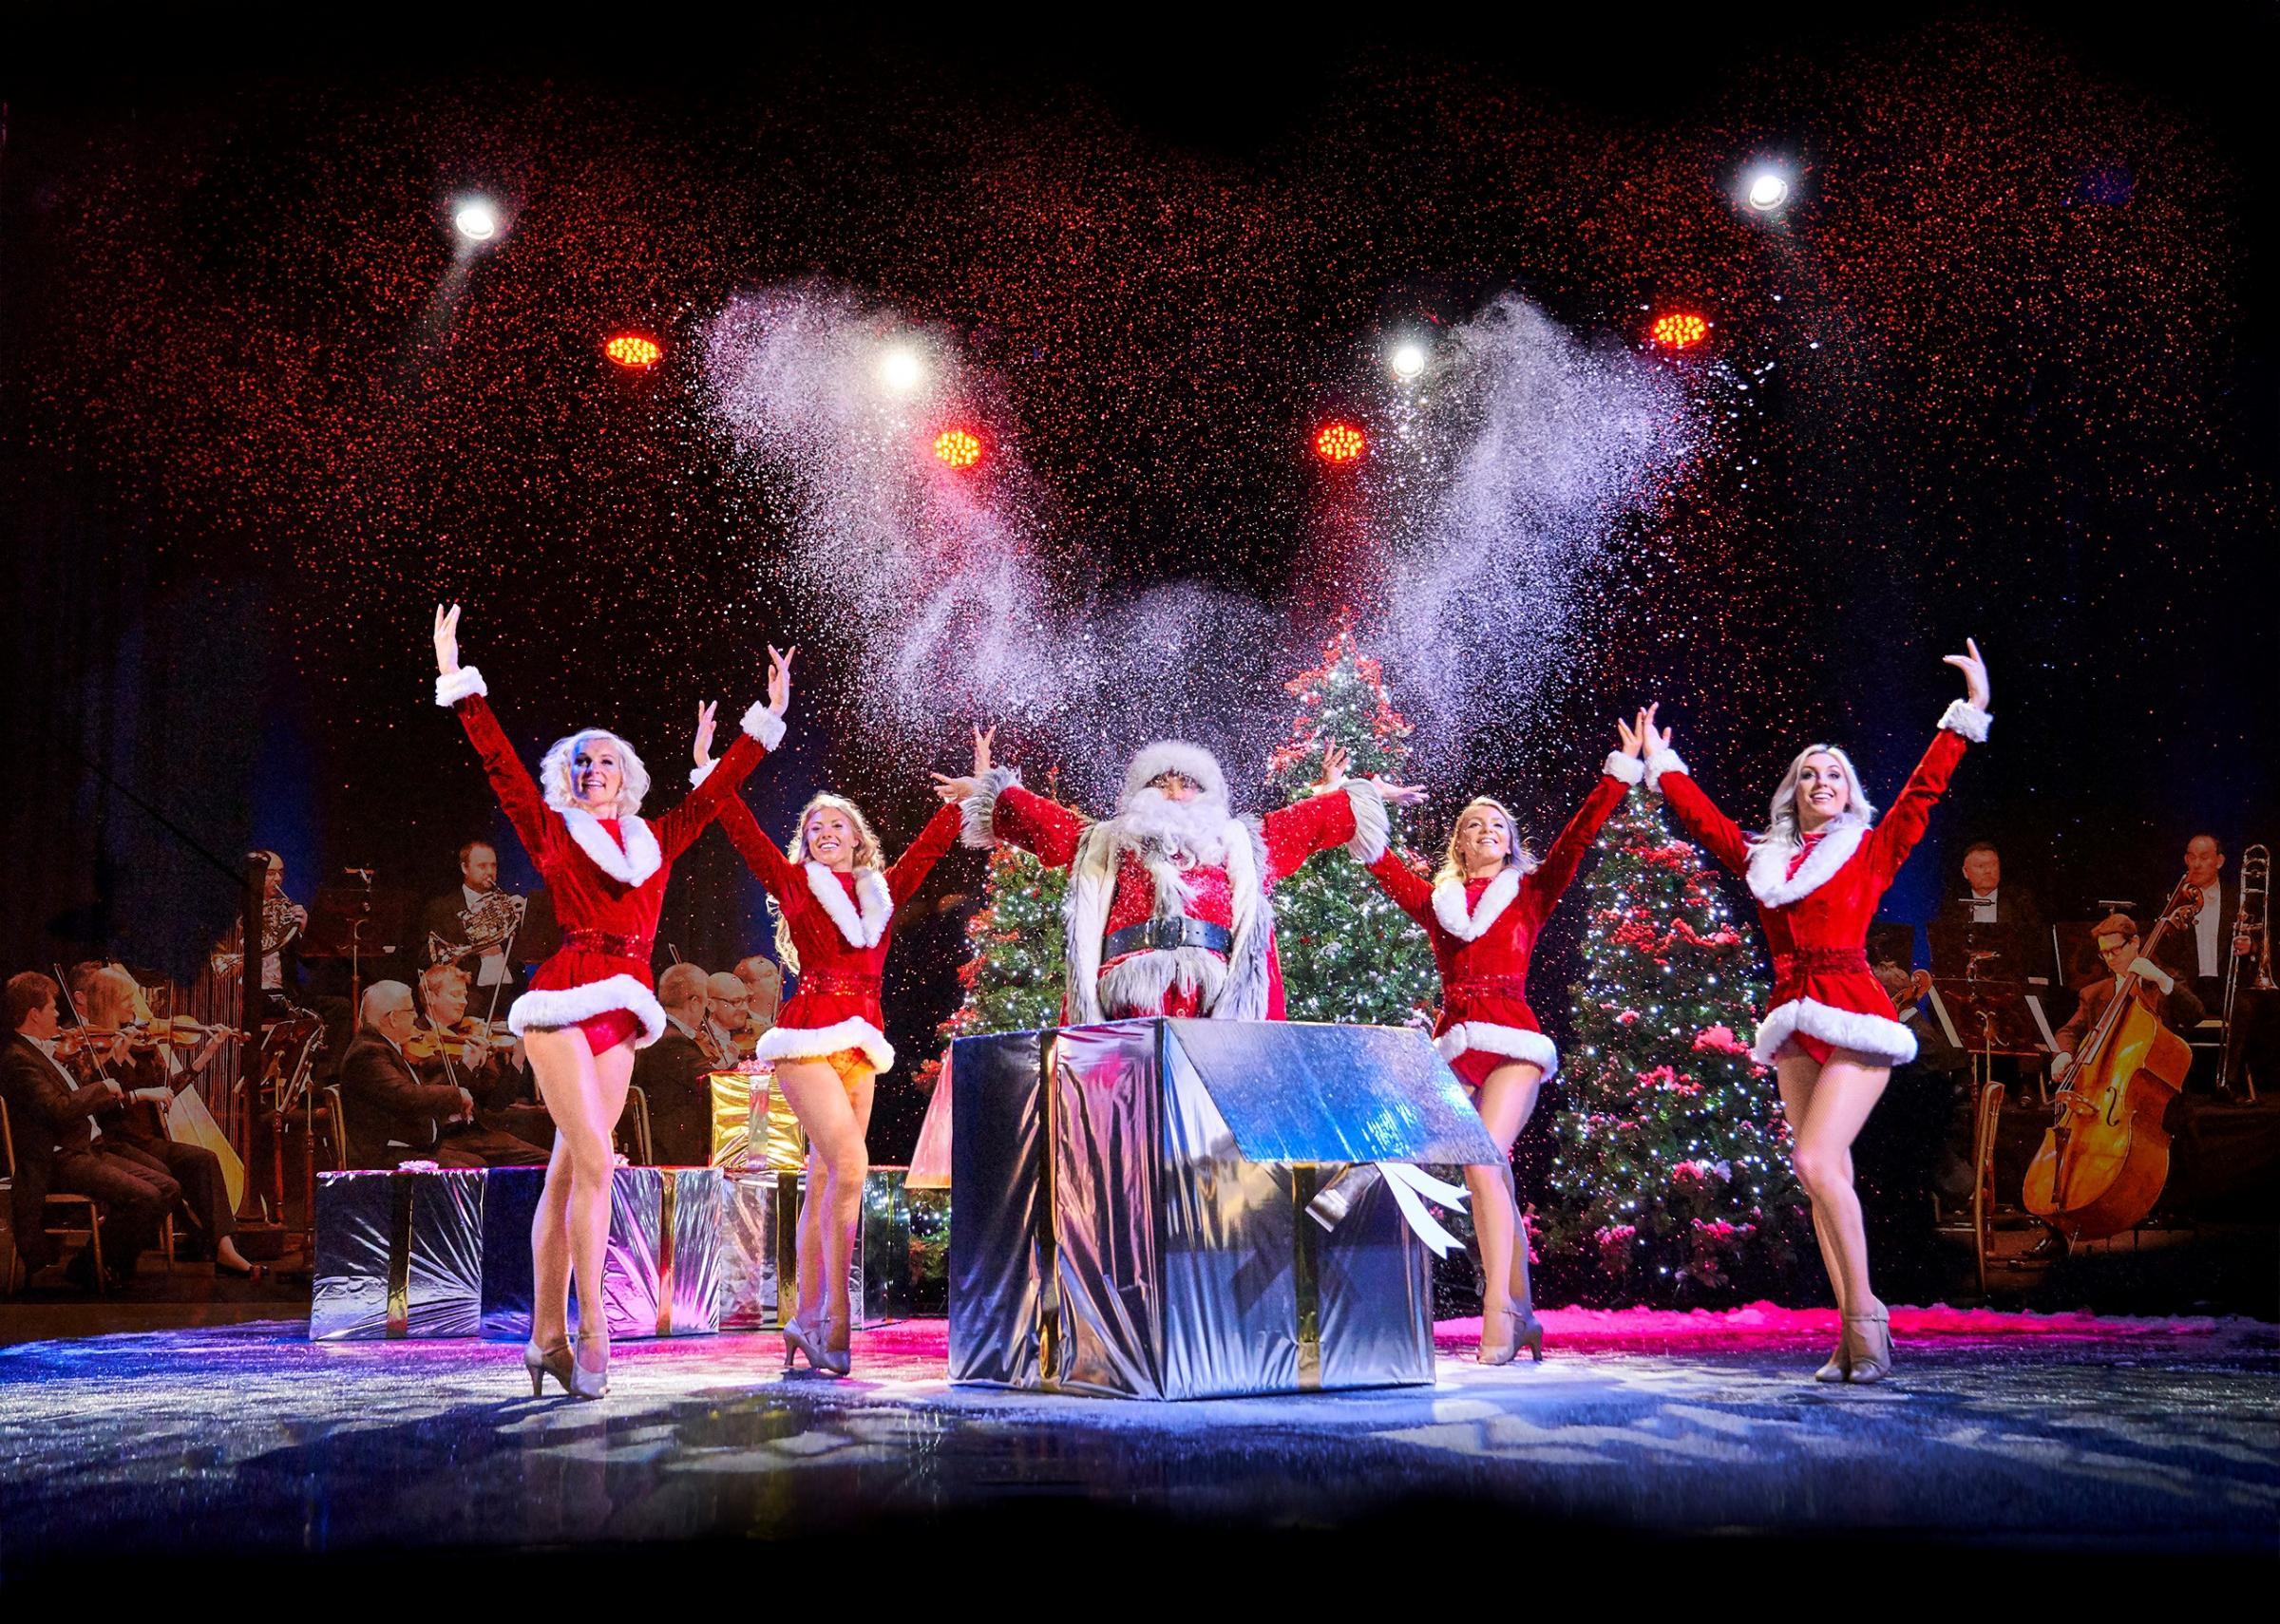 Christmas Spectacular at London Palladium on 17 December at 19:00